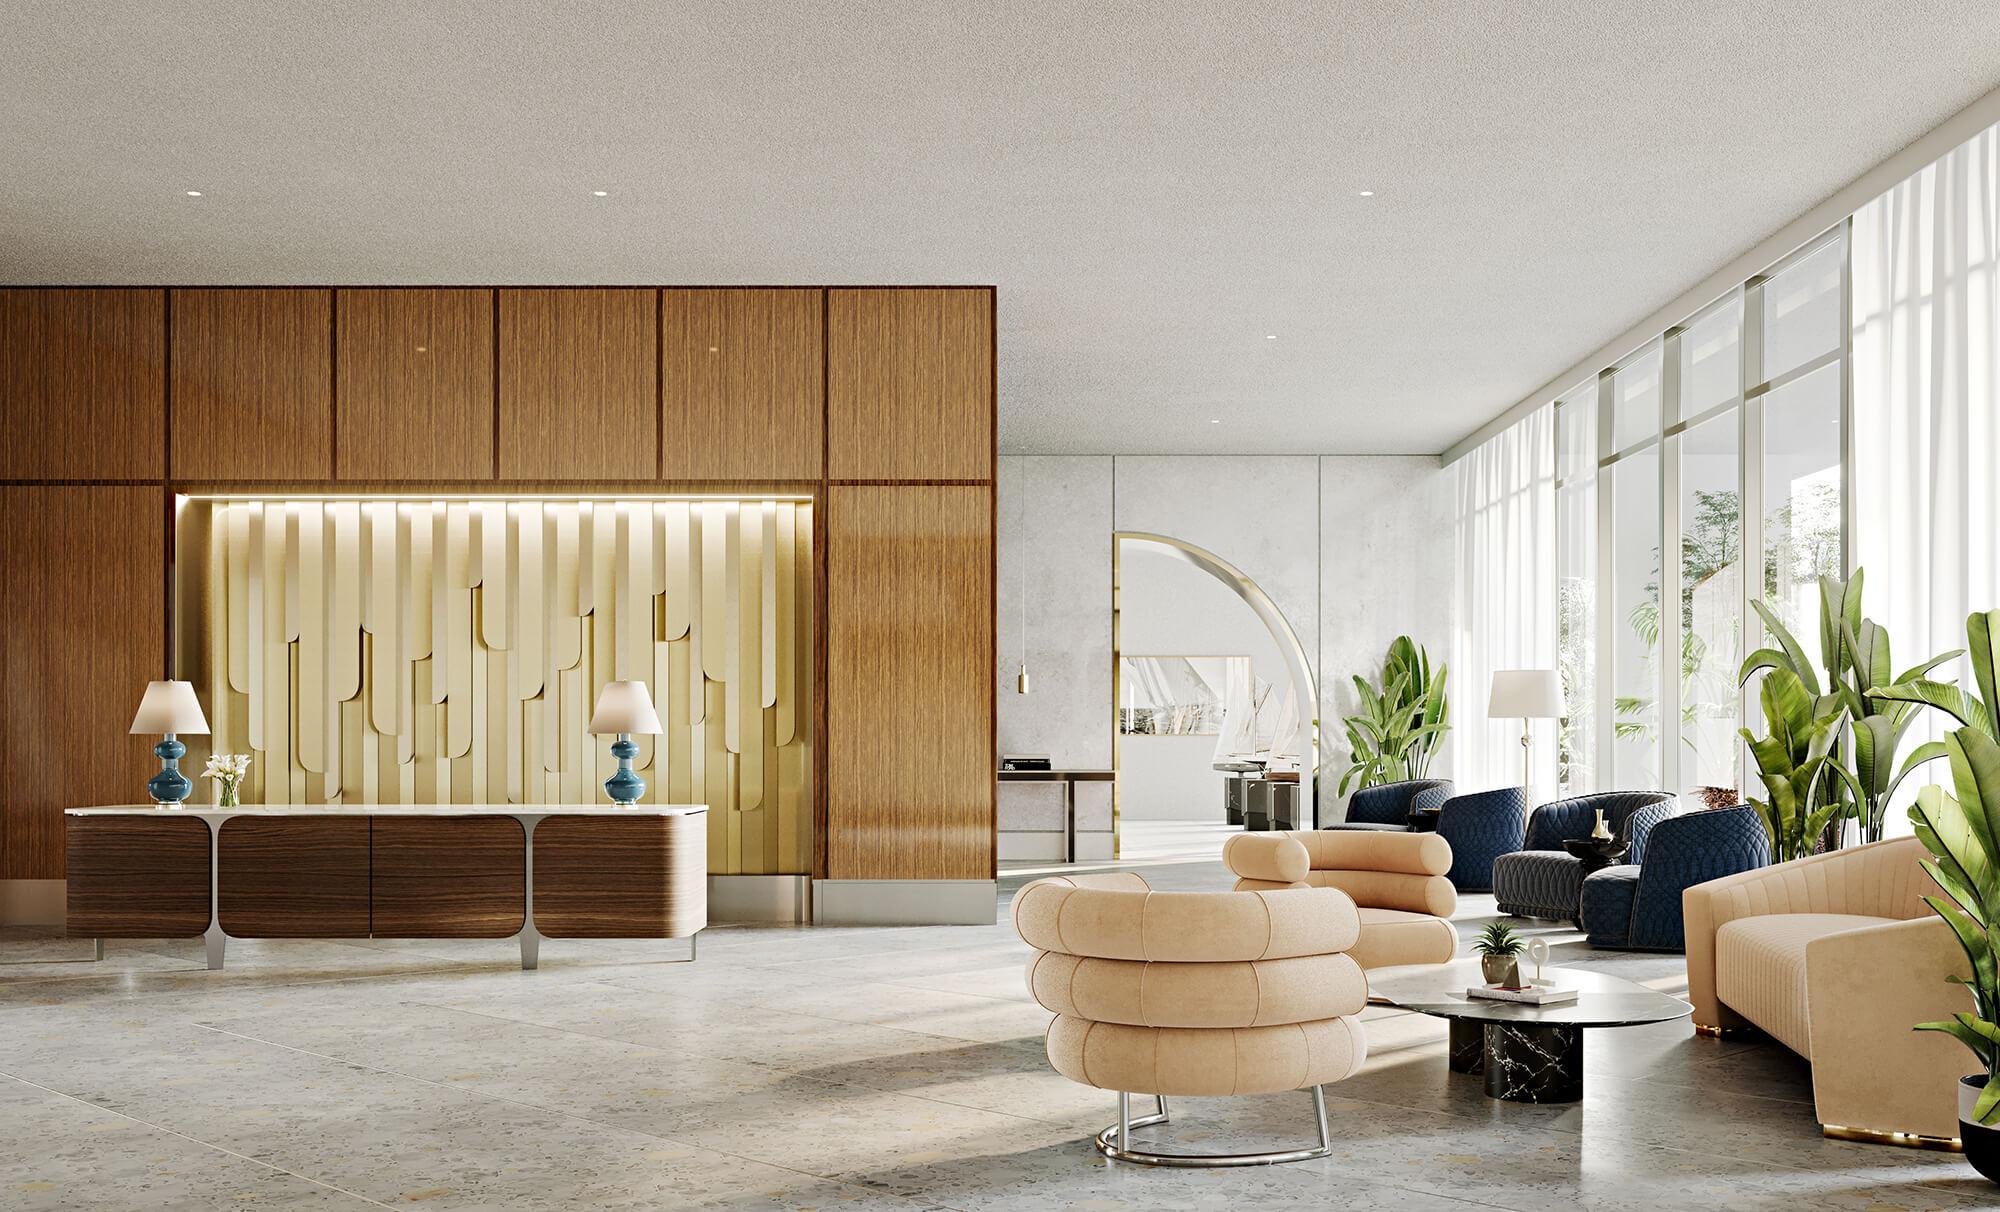 Luxury lobby entrance interior design at the Mr.C Residences Miami.